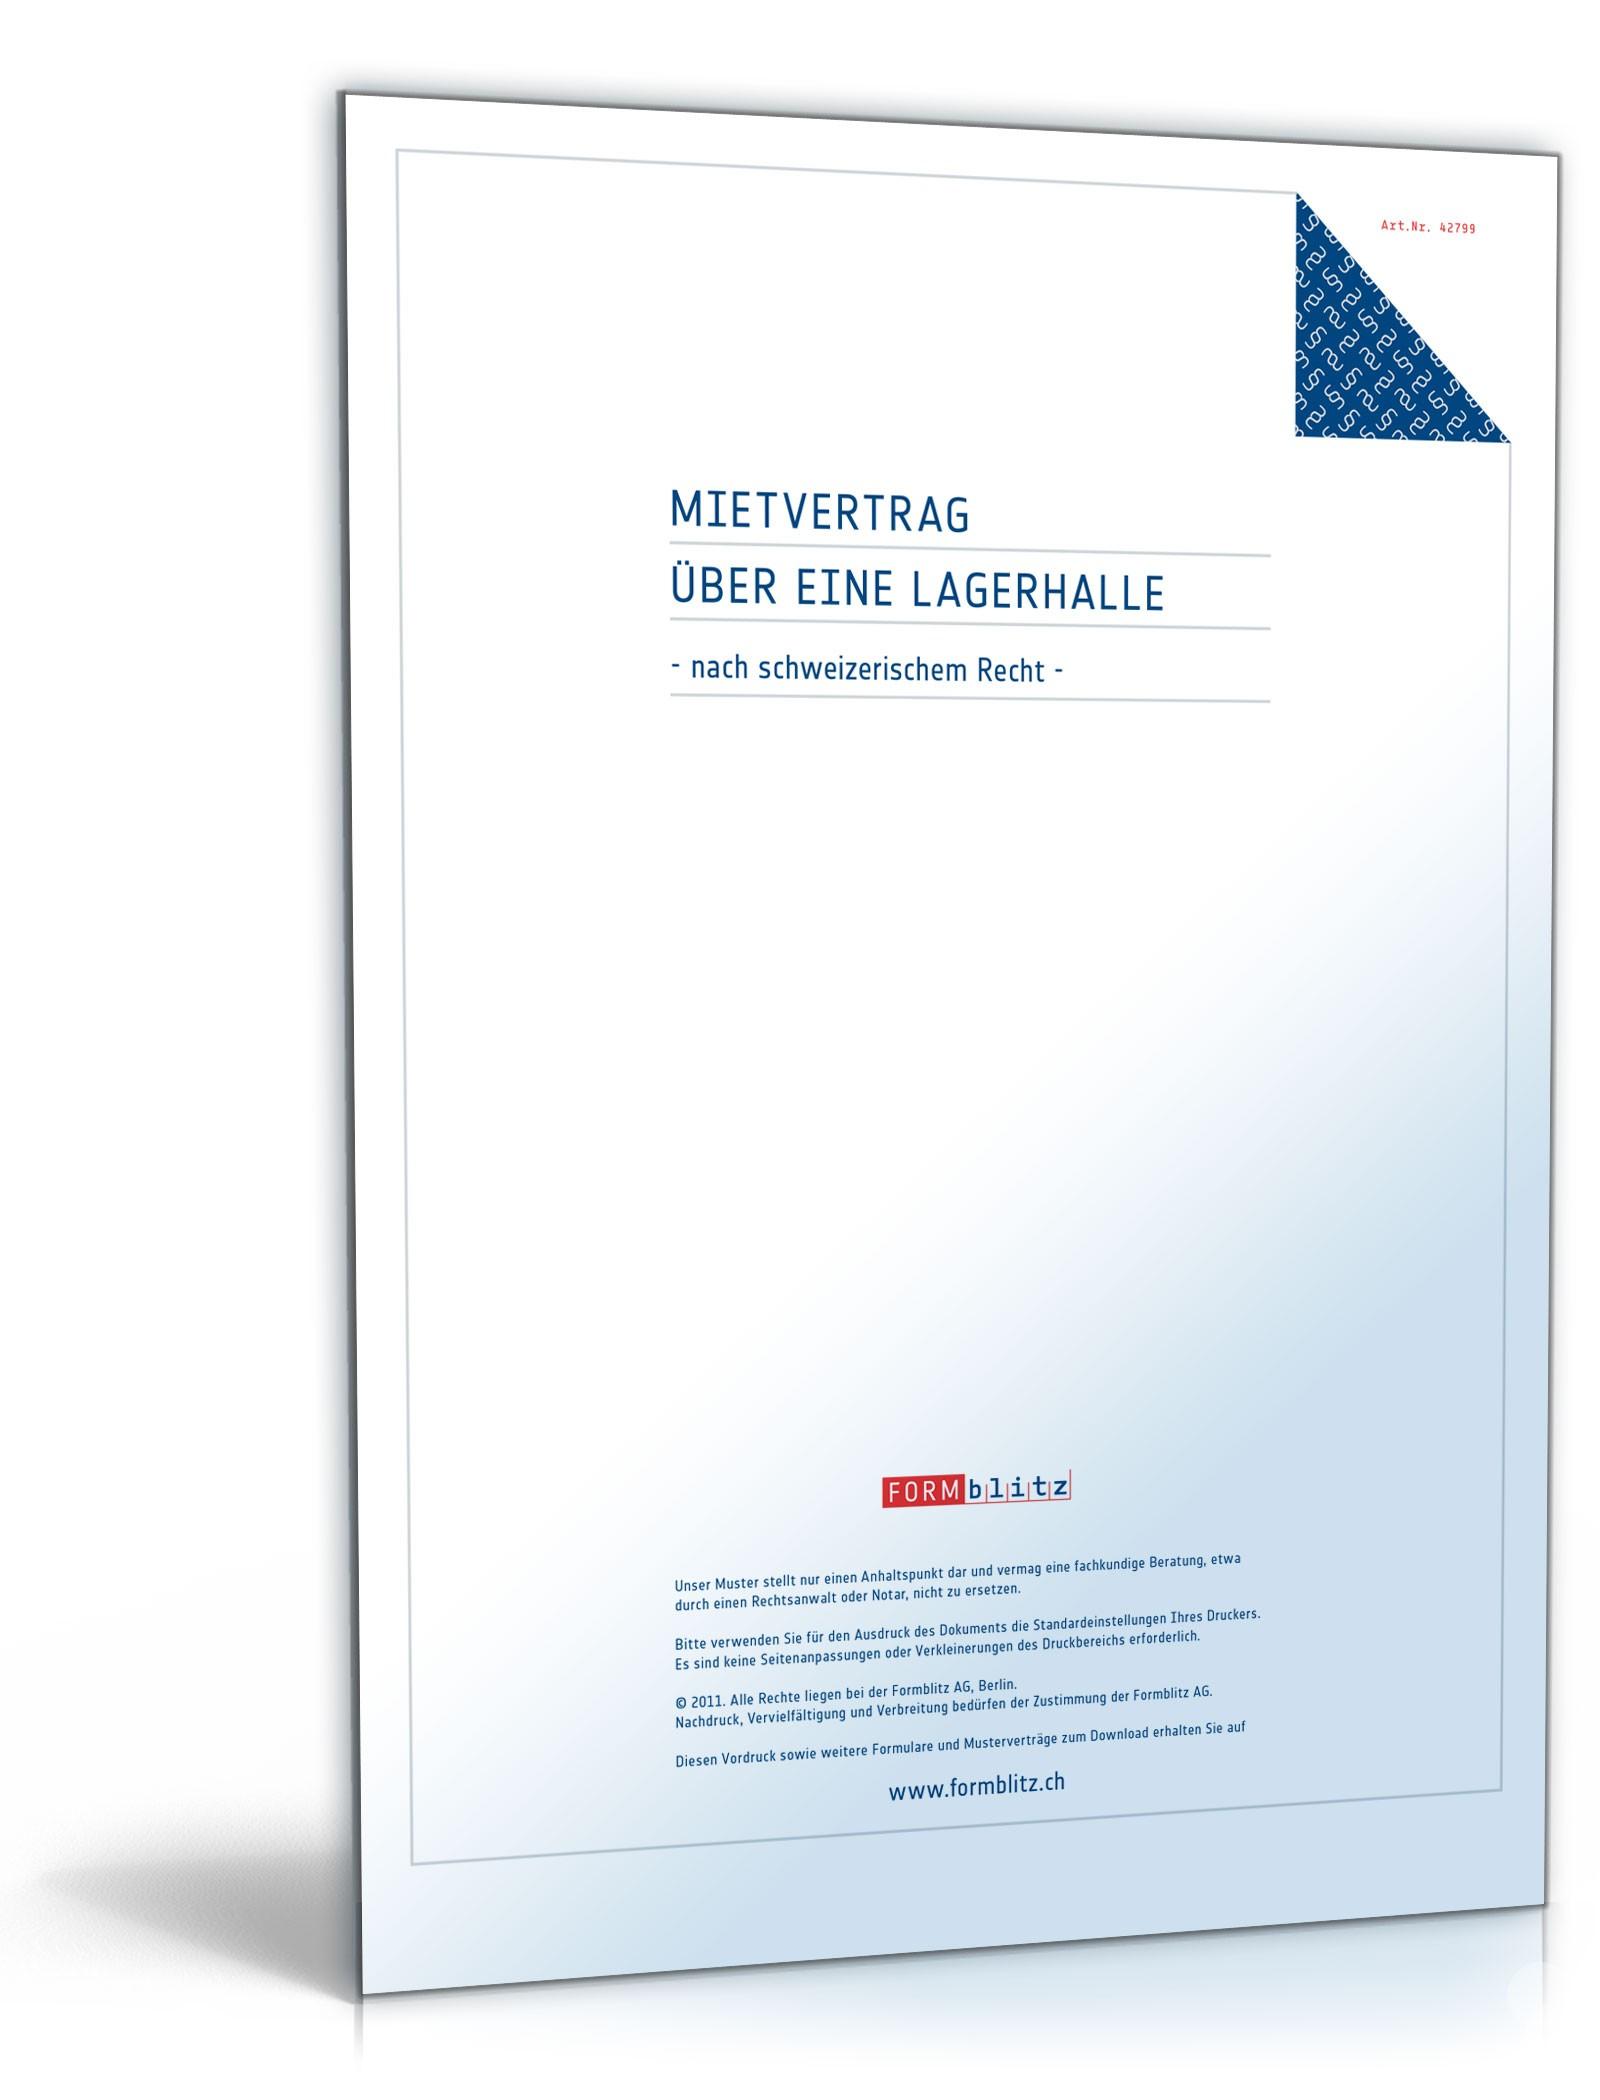 Mietvertrag Lagerraum Pdf Free Download 0